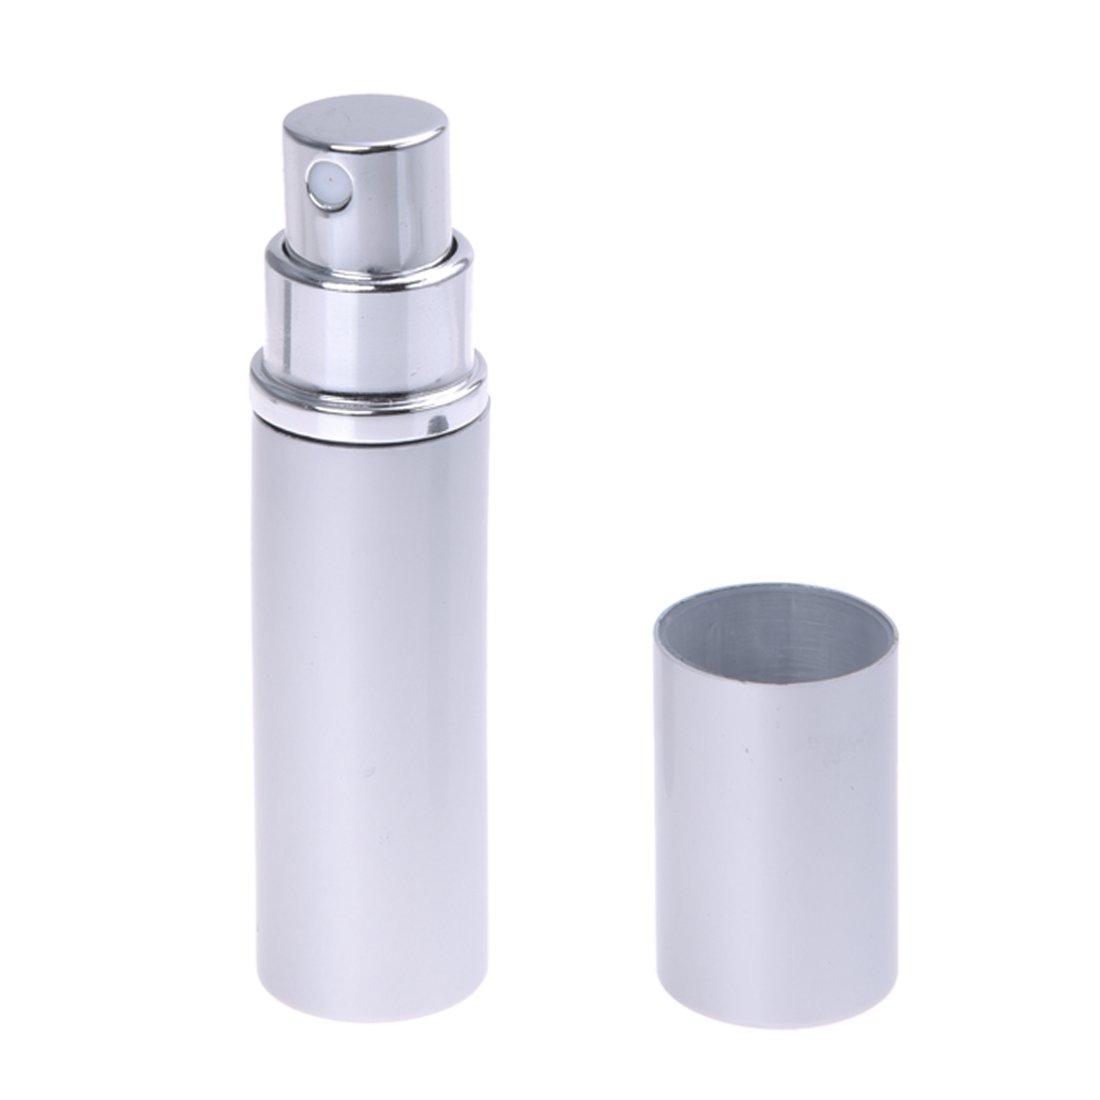 AKORD Refillable Perfume Atomiser Spray Bottle, Silver HO-114